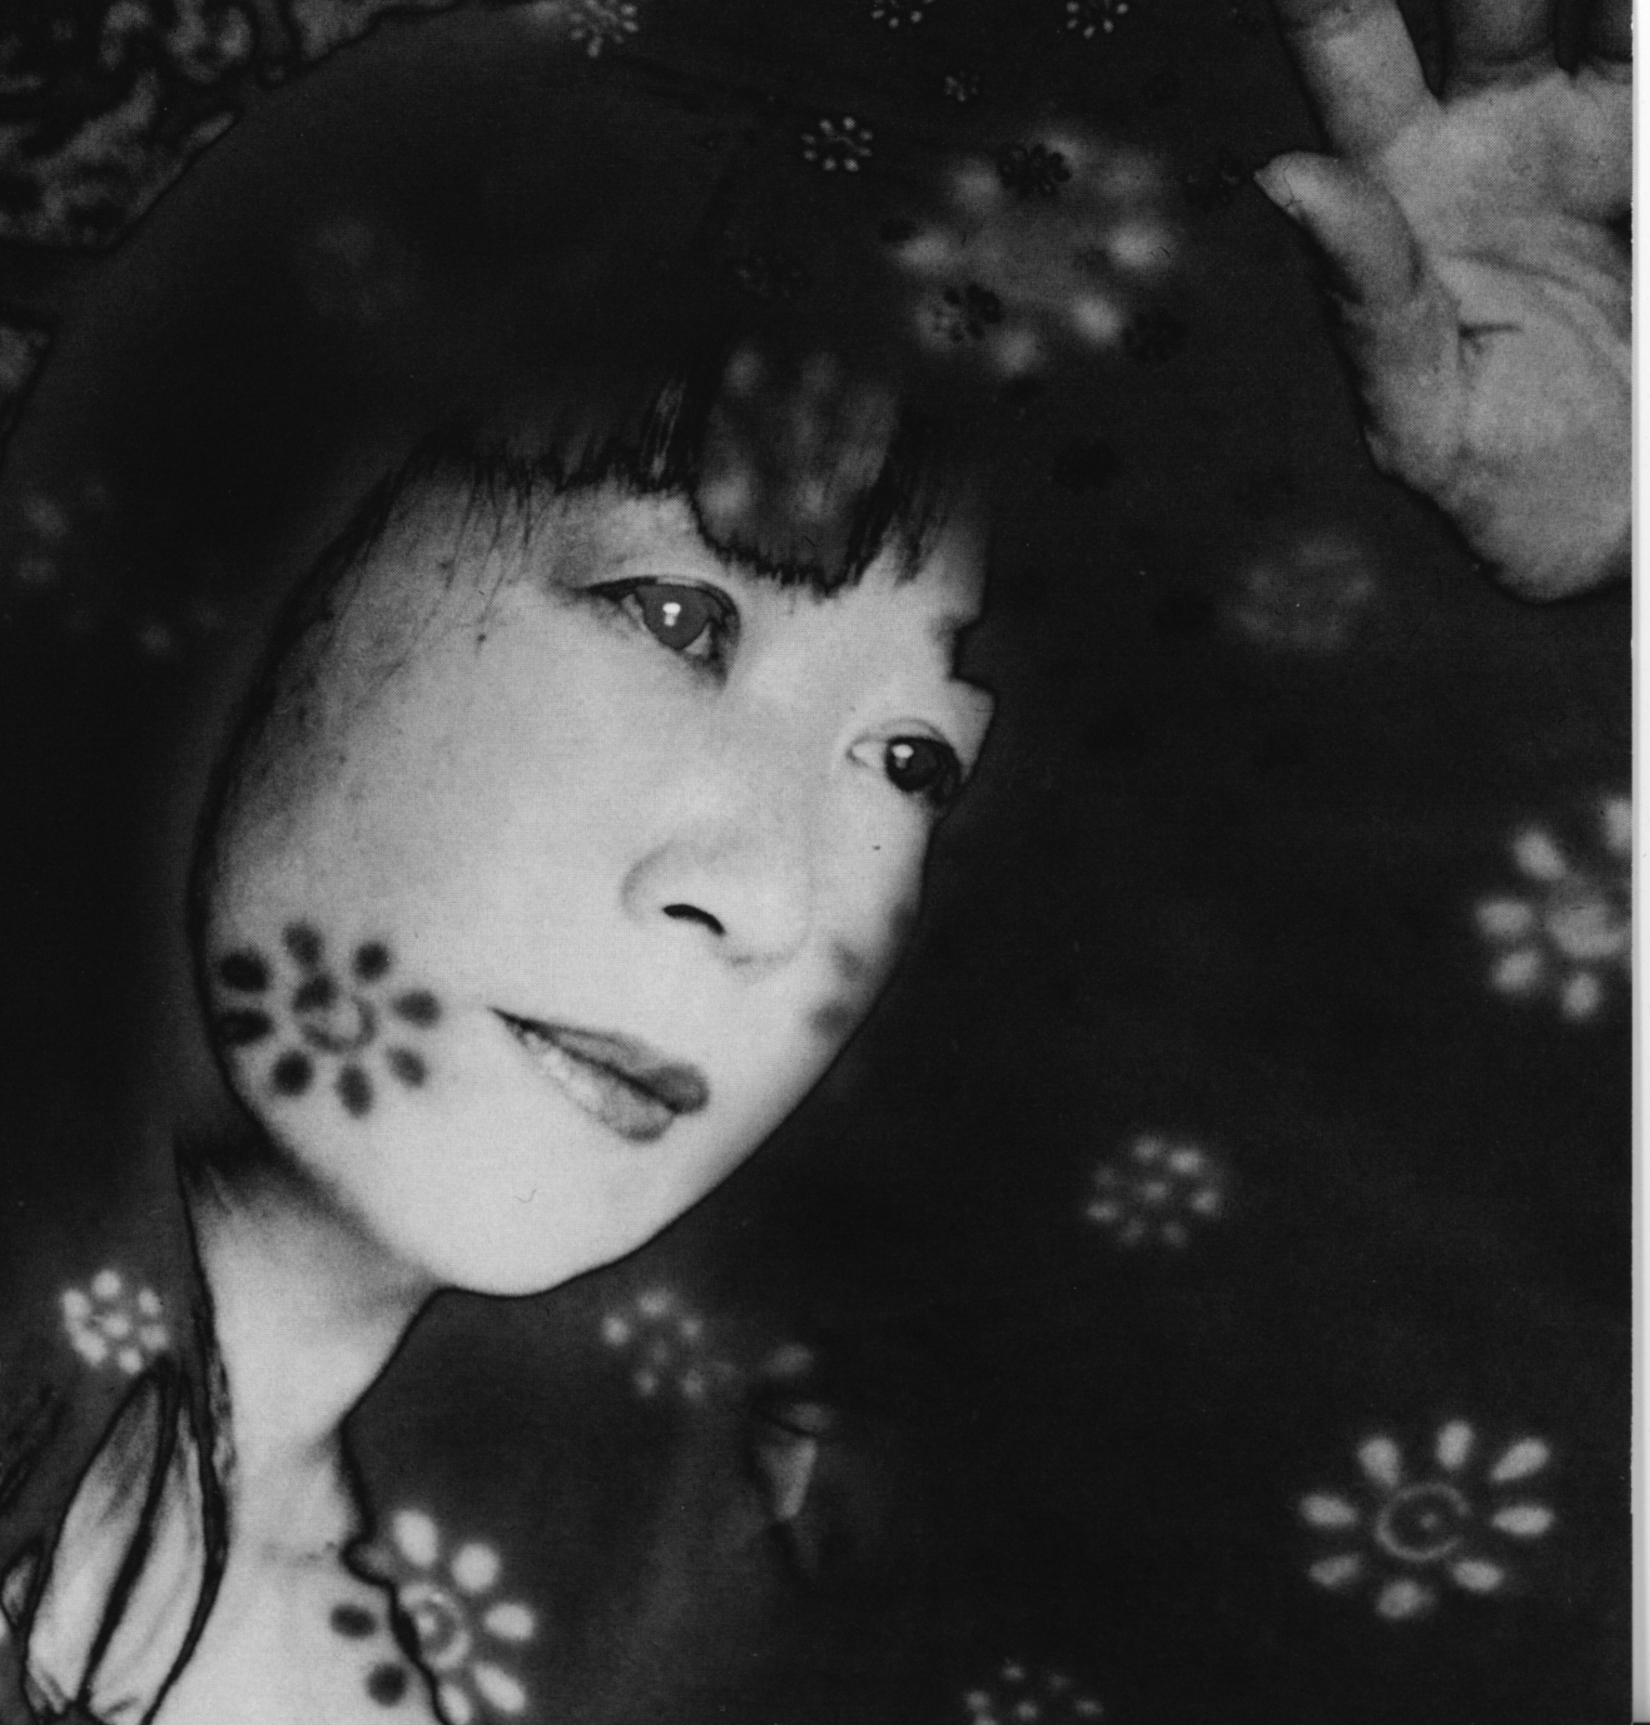 Ikue Mori, photograph by Heung Heung Chin